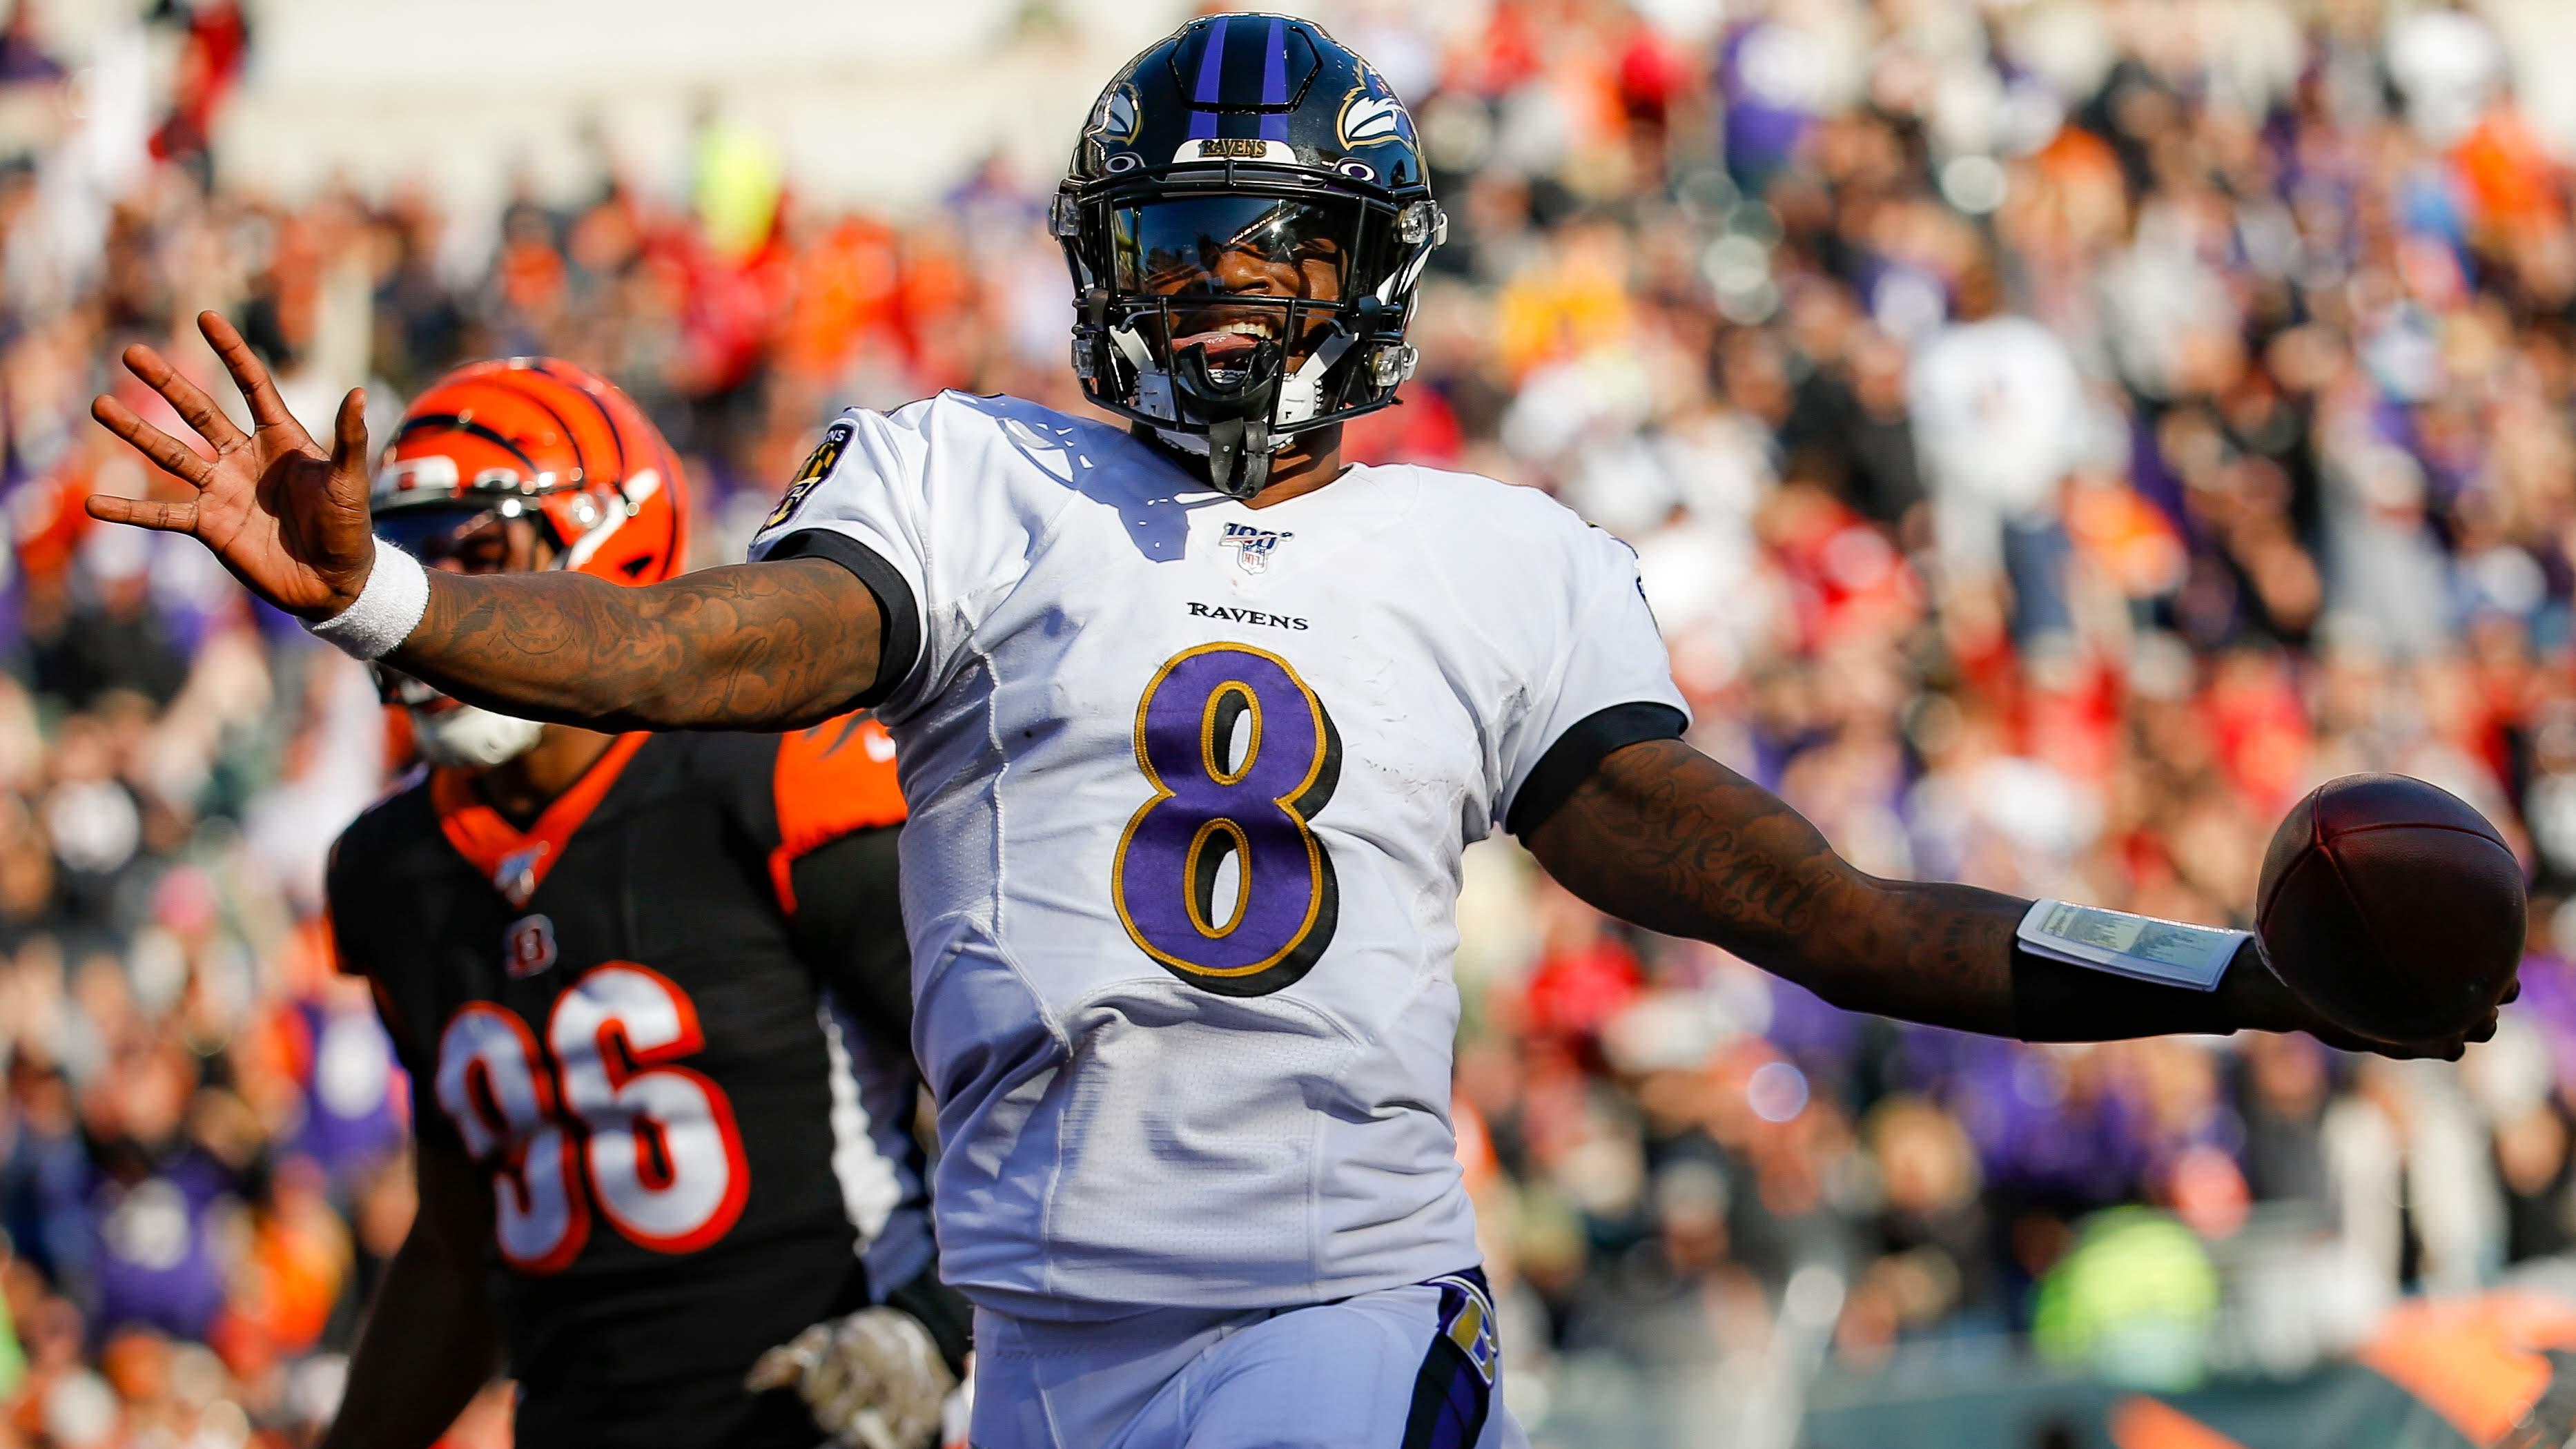 Baltimore's Lamar Jackson producing an MVP spin